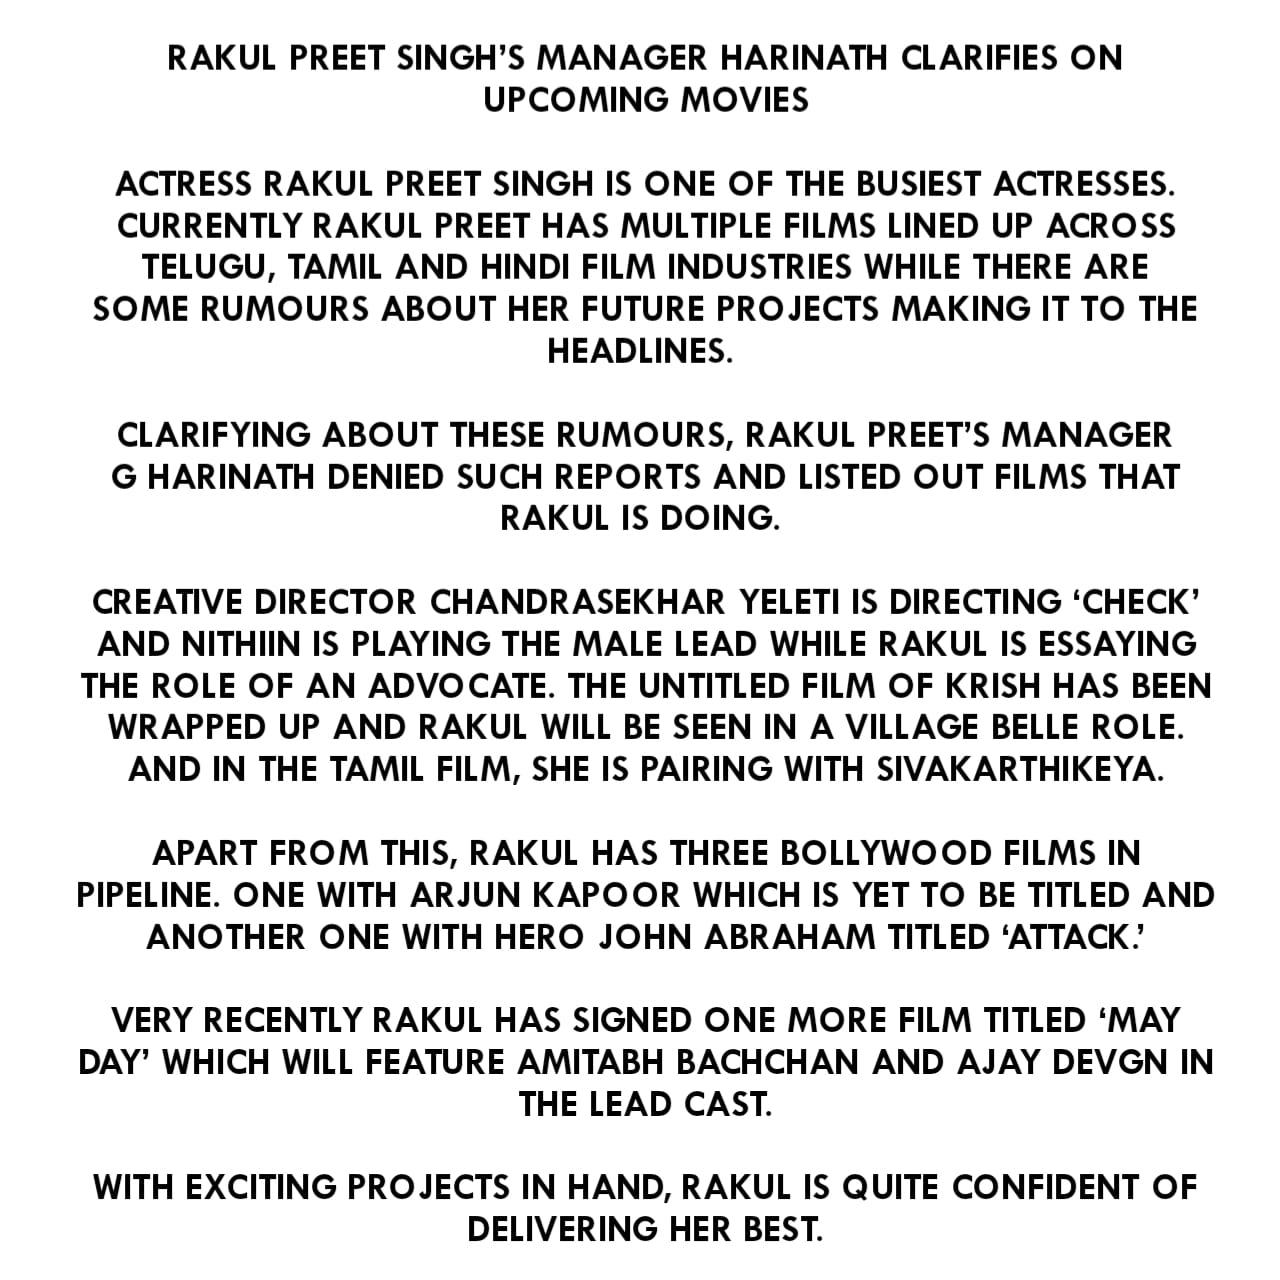 Here is the Rakul Preet Singh's Upcoming Movies list